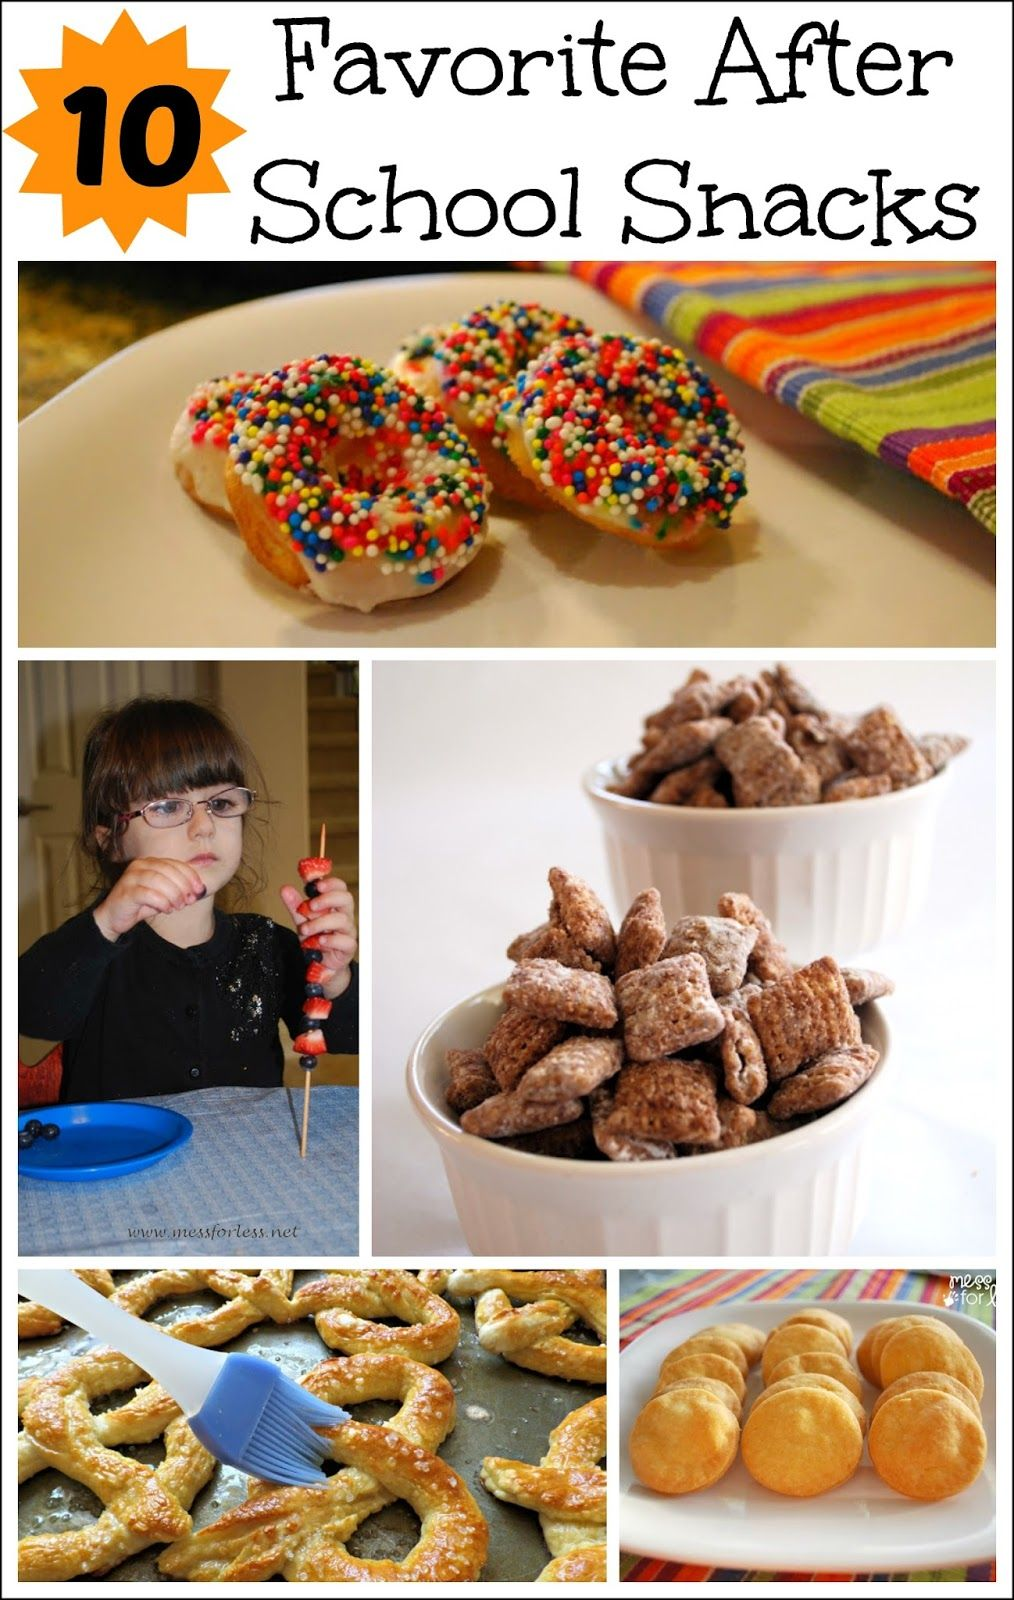 Snack Foods Diet Snack Food Recipe Ideas Wherever Top 10 Junk Food Snacks Livingroom Kitchen Interiordesign B Junk Food Snacks Sleepover Food Junk Food